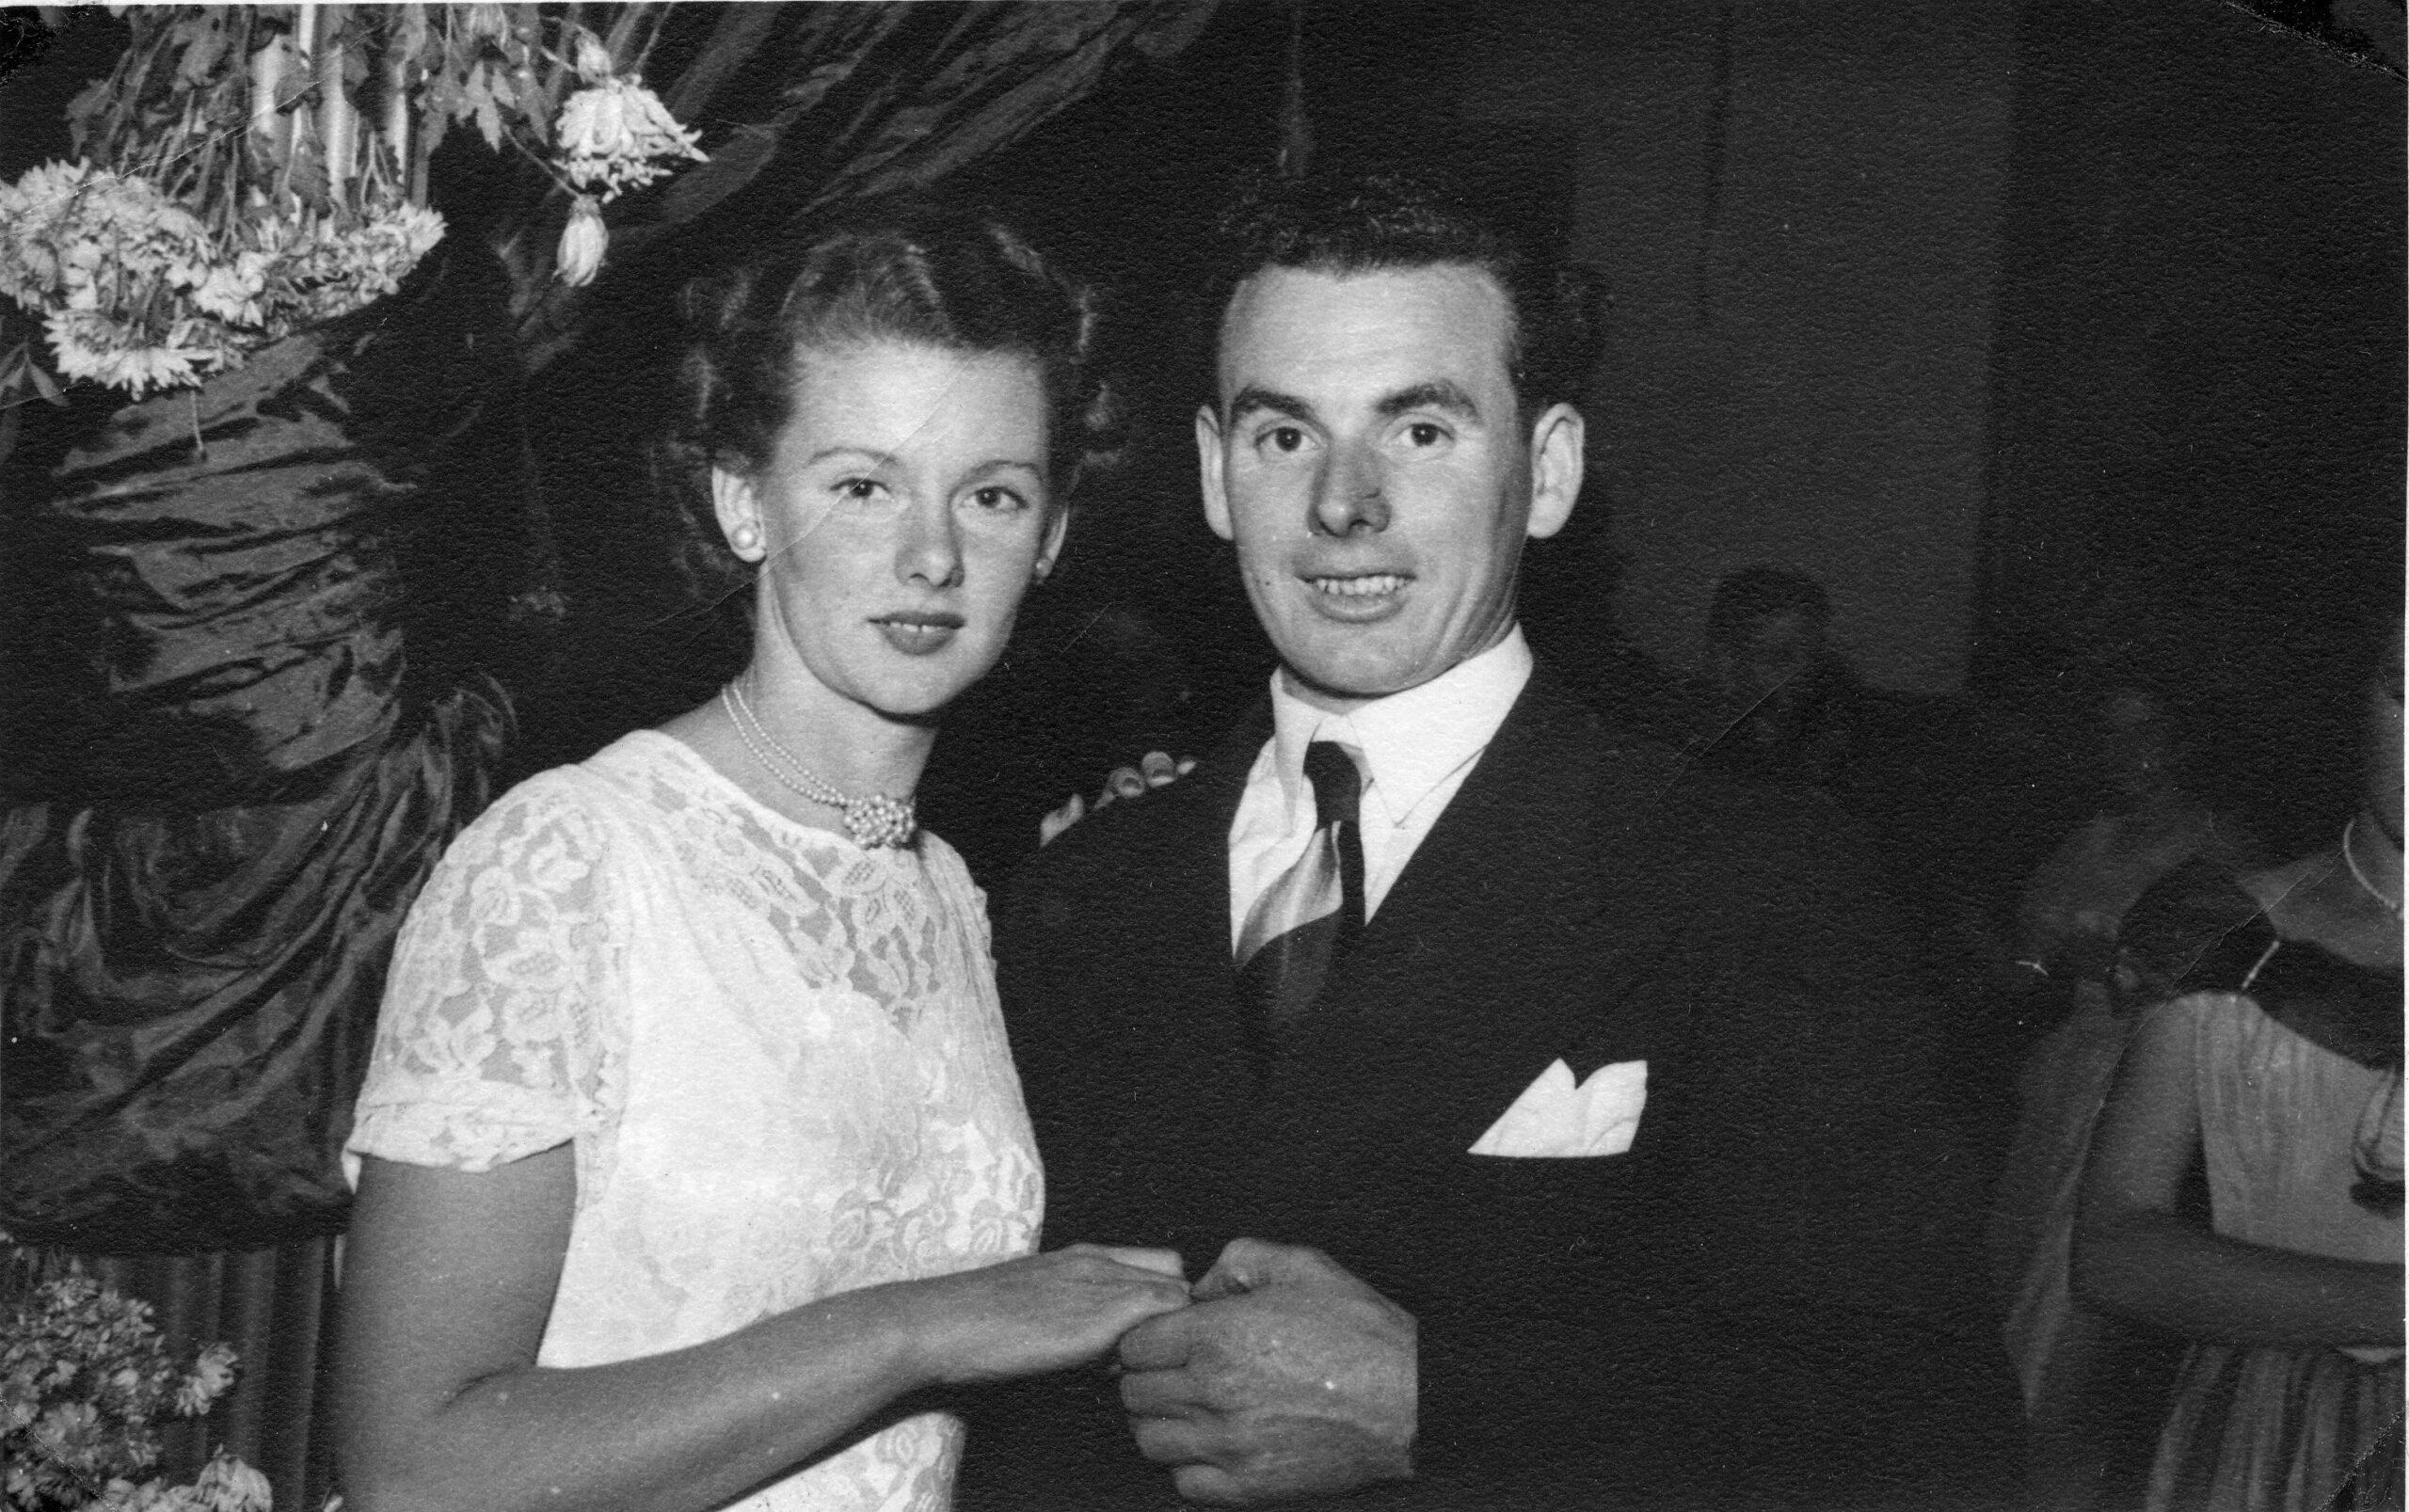 Bill and Beryl Heath at a ball.